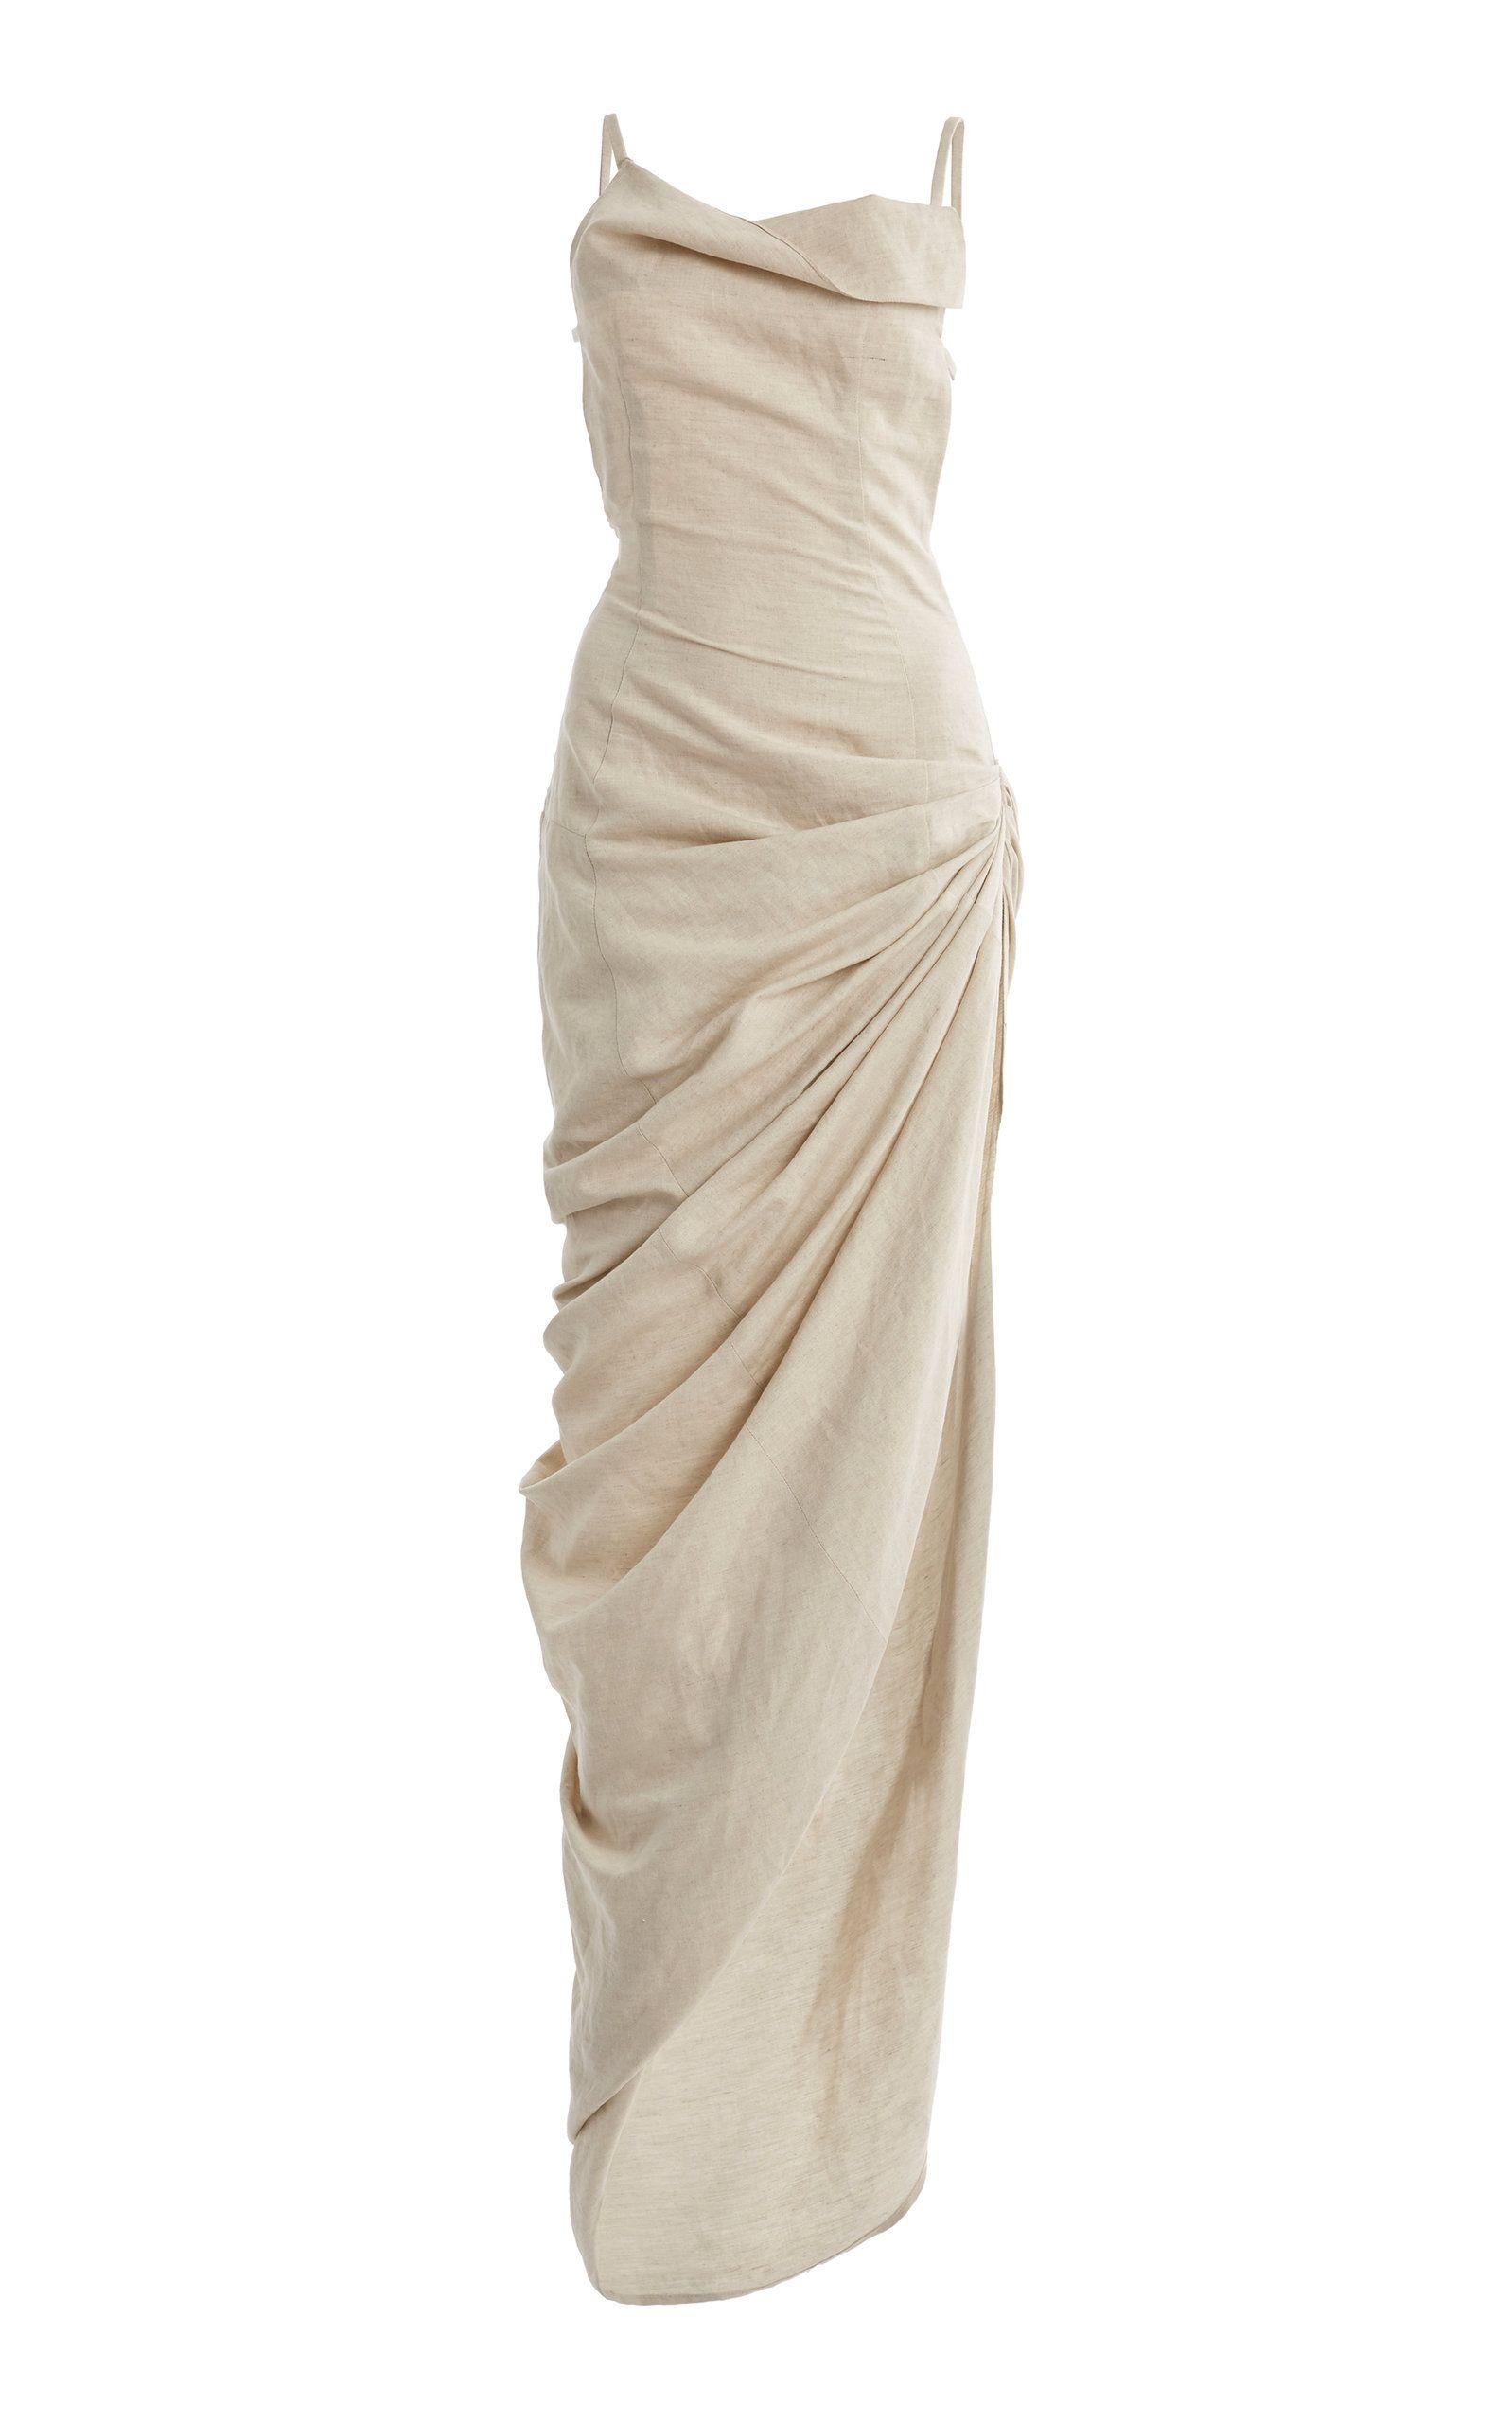 Saudade Gathered Cotton-Blend Maxi Dress by JACQUEMUS Now Available on Moda Operandi